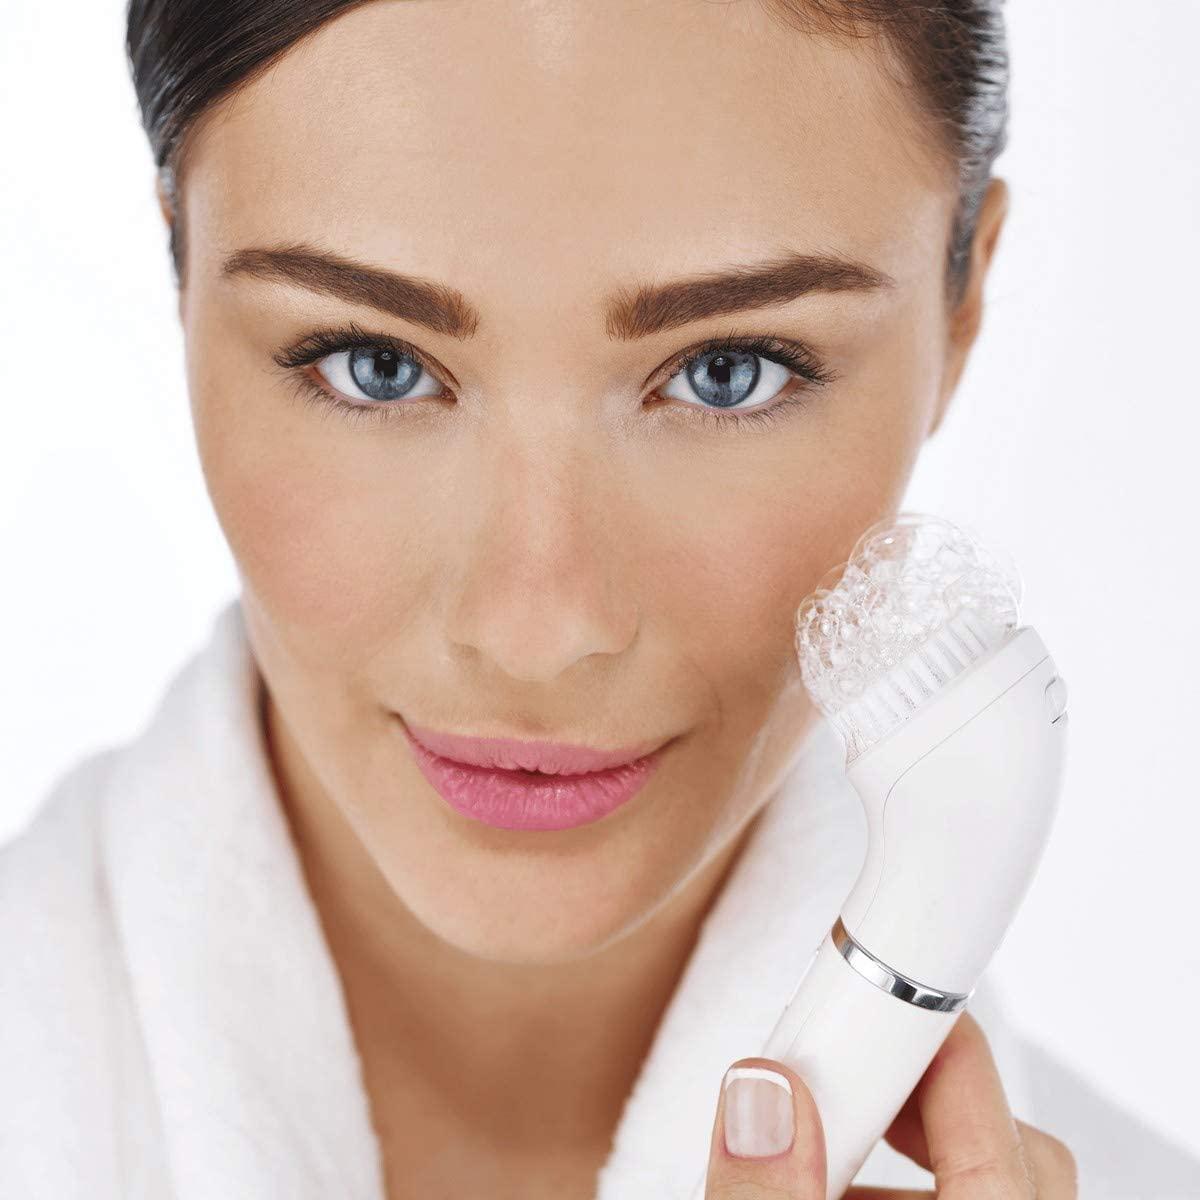 Braun Face 831 Womens Ladies Facial Hair Epilator 4